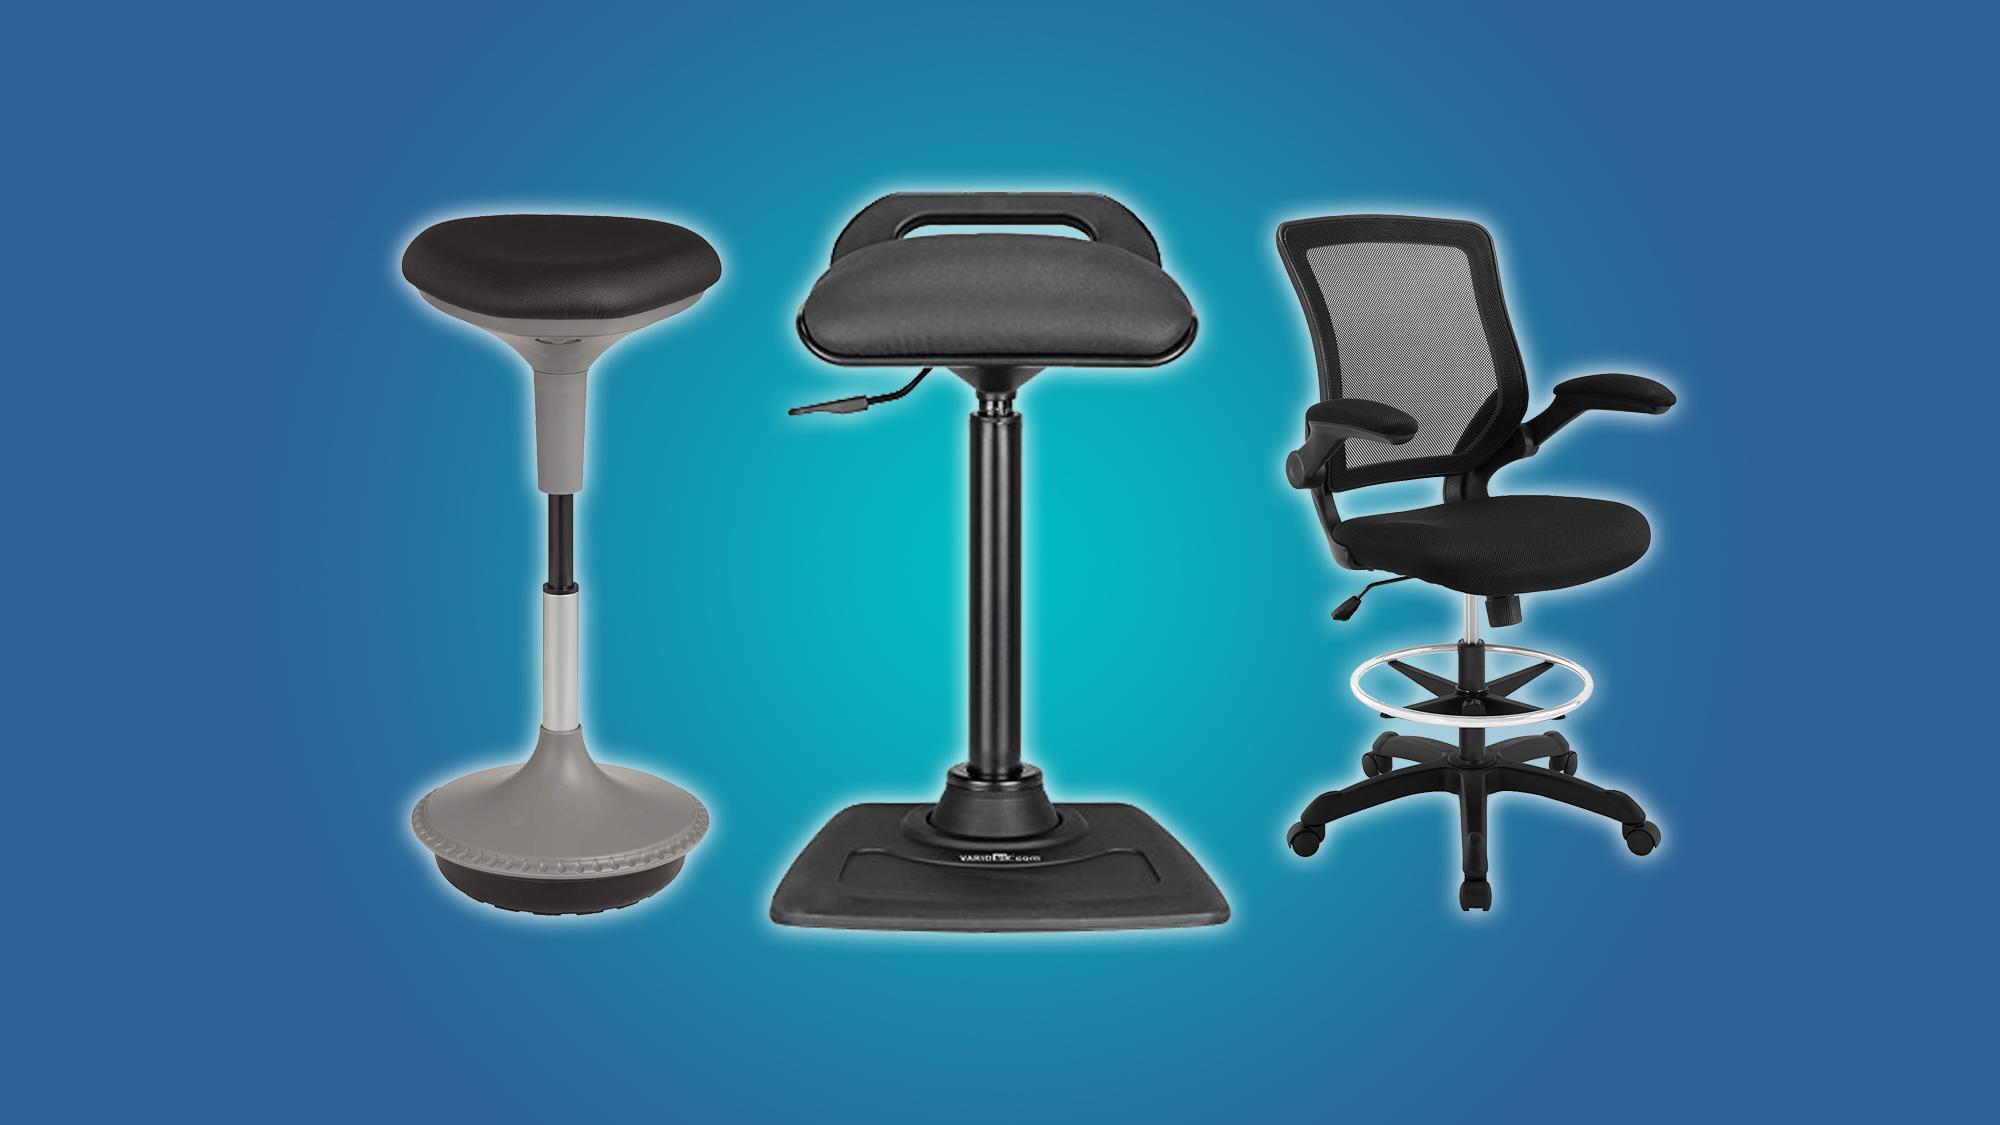 The Best Stools For Standing Desks